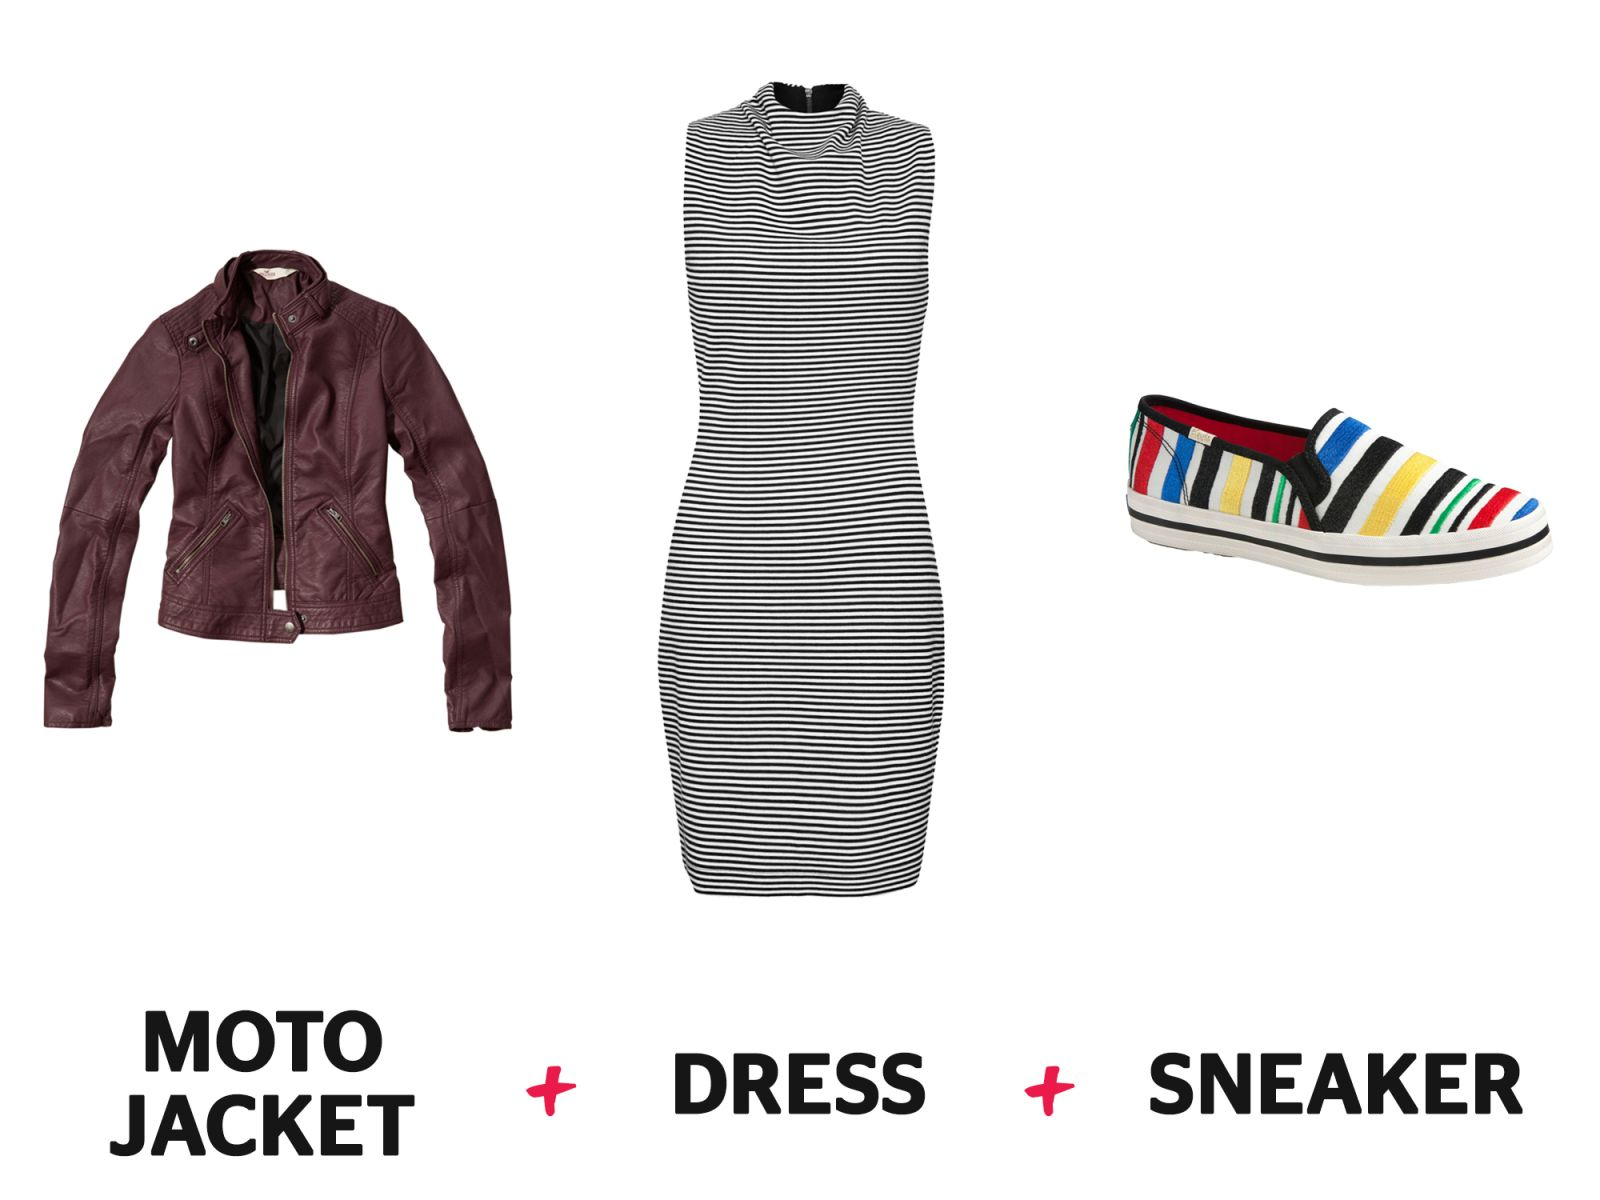 Fashion Formula: Dress + Moto Jacket + Sneaker  - Redbook.com